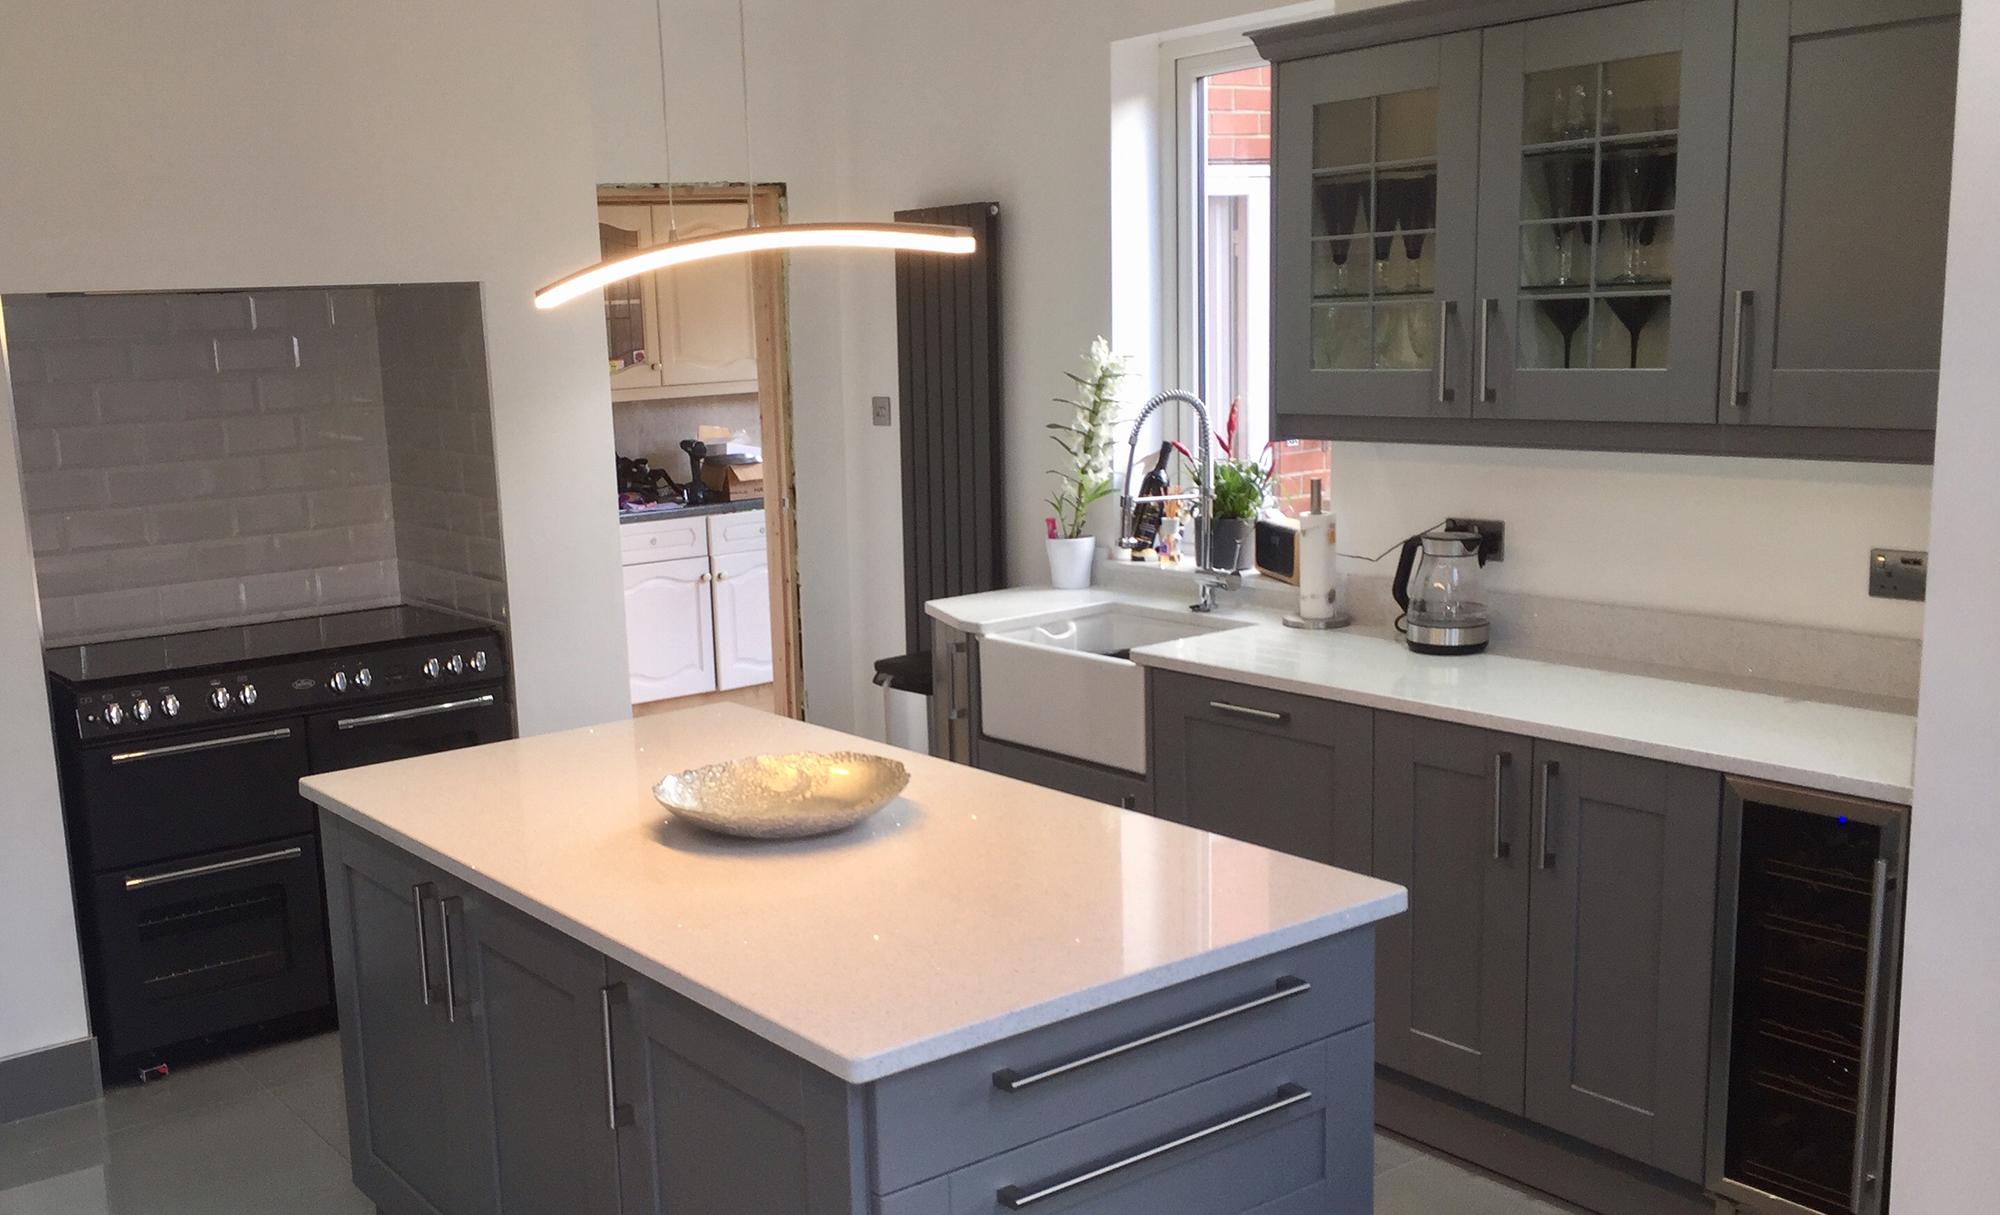 Madison Dust Grey Shaker Style Kitchen from Kitchen Stori